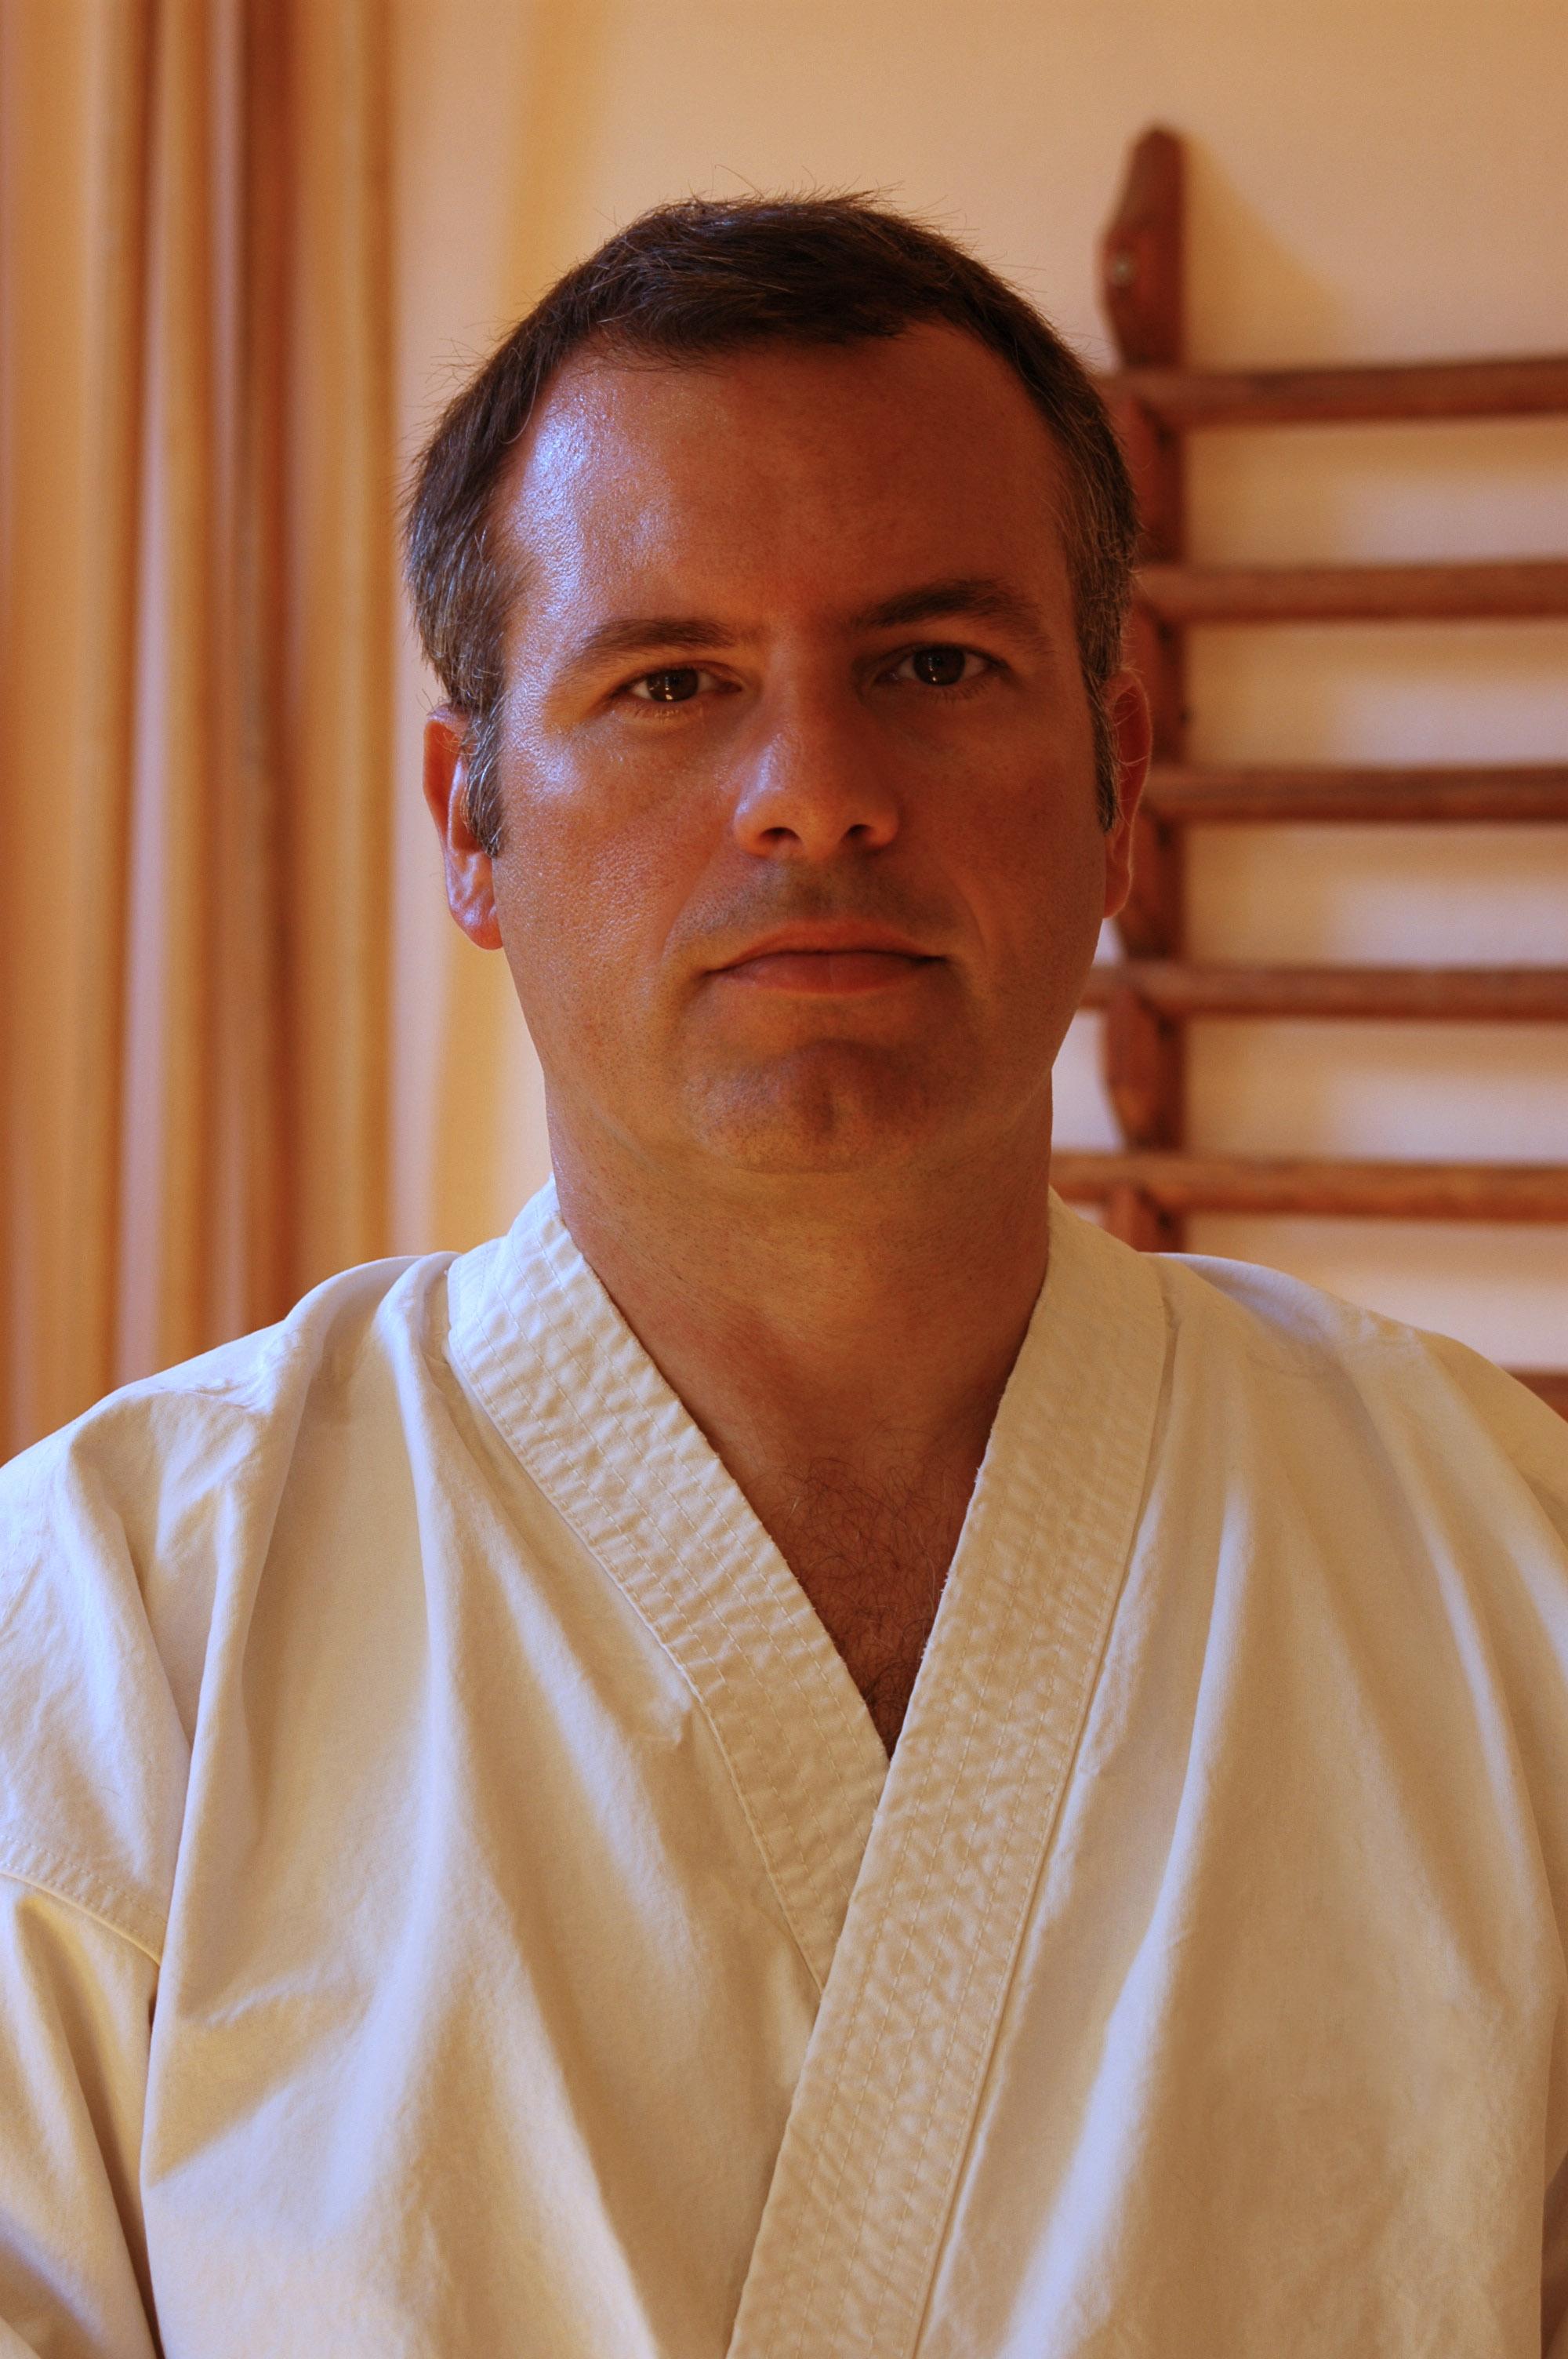 Shibucho Rogelio Casero